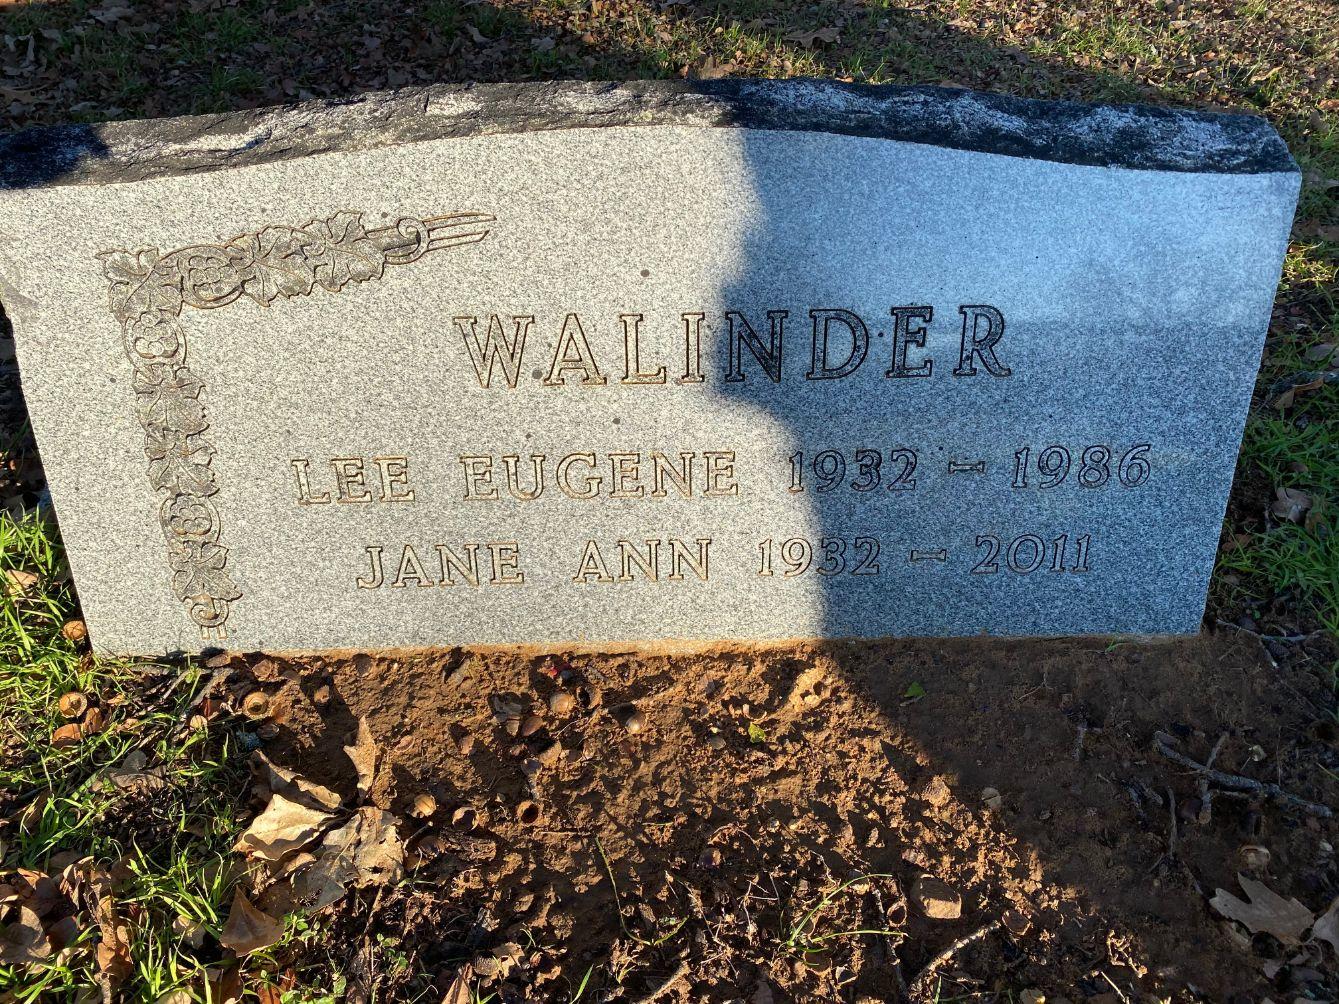 Walinder